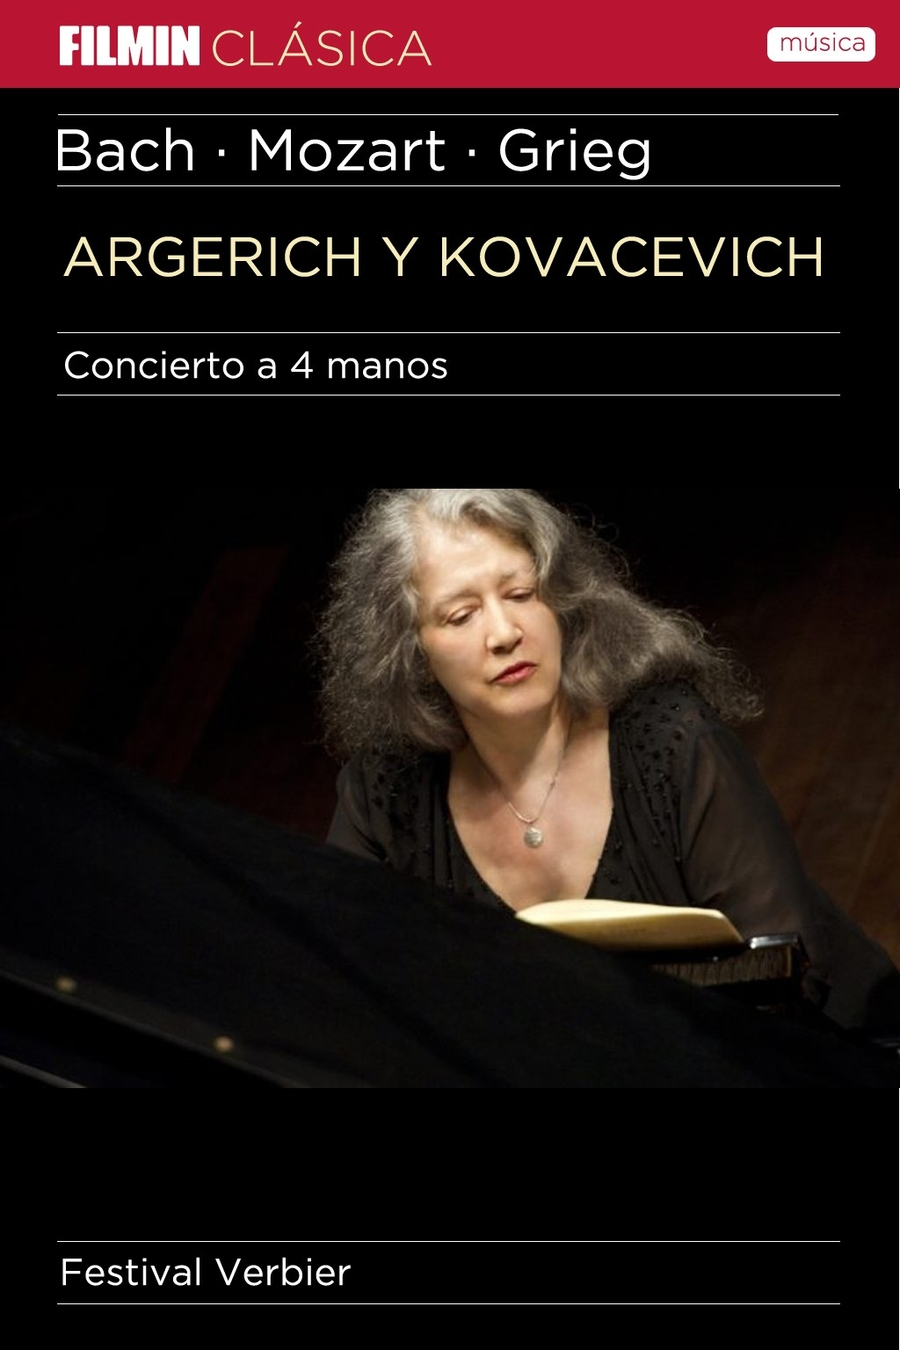 Argerich y Kovacevic